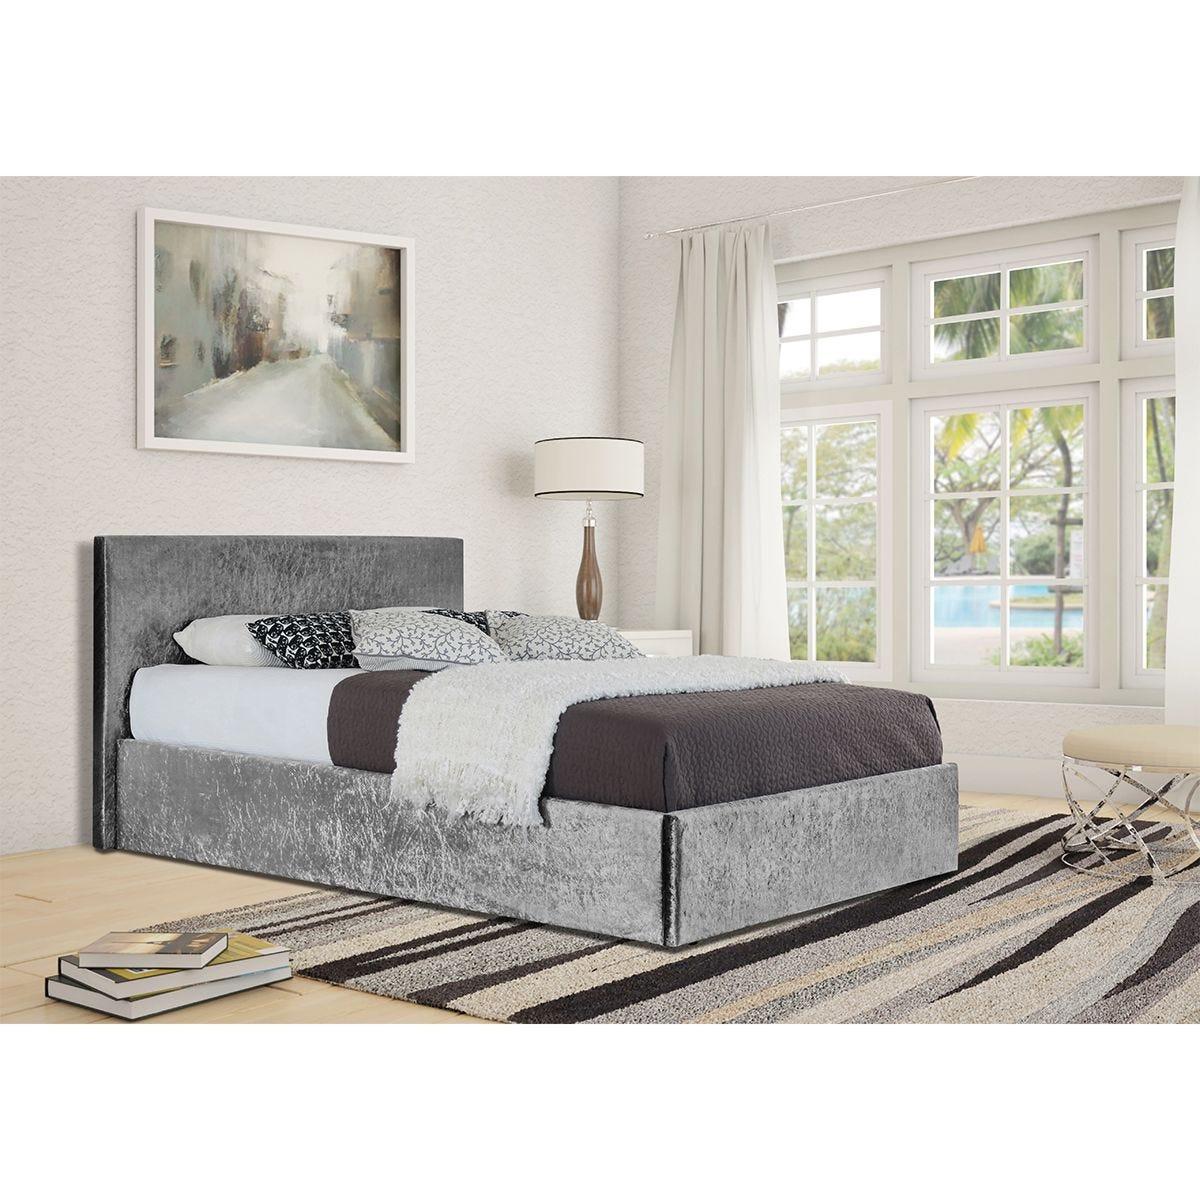 Theodore Ottoman Storage Bed - Silver